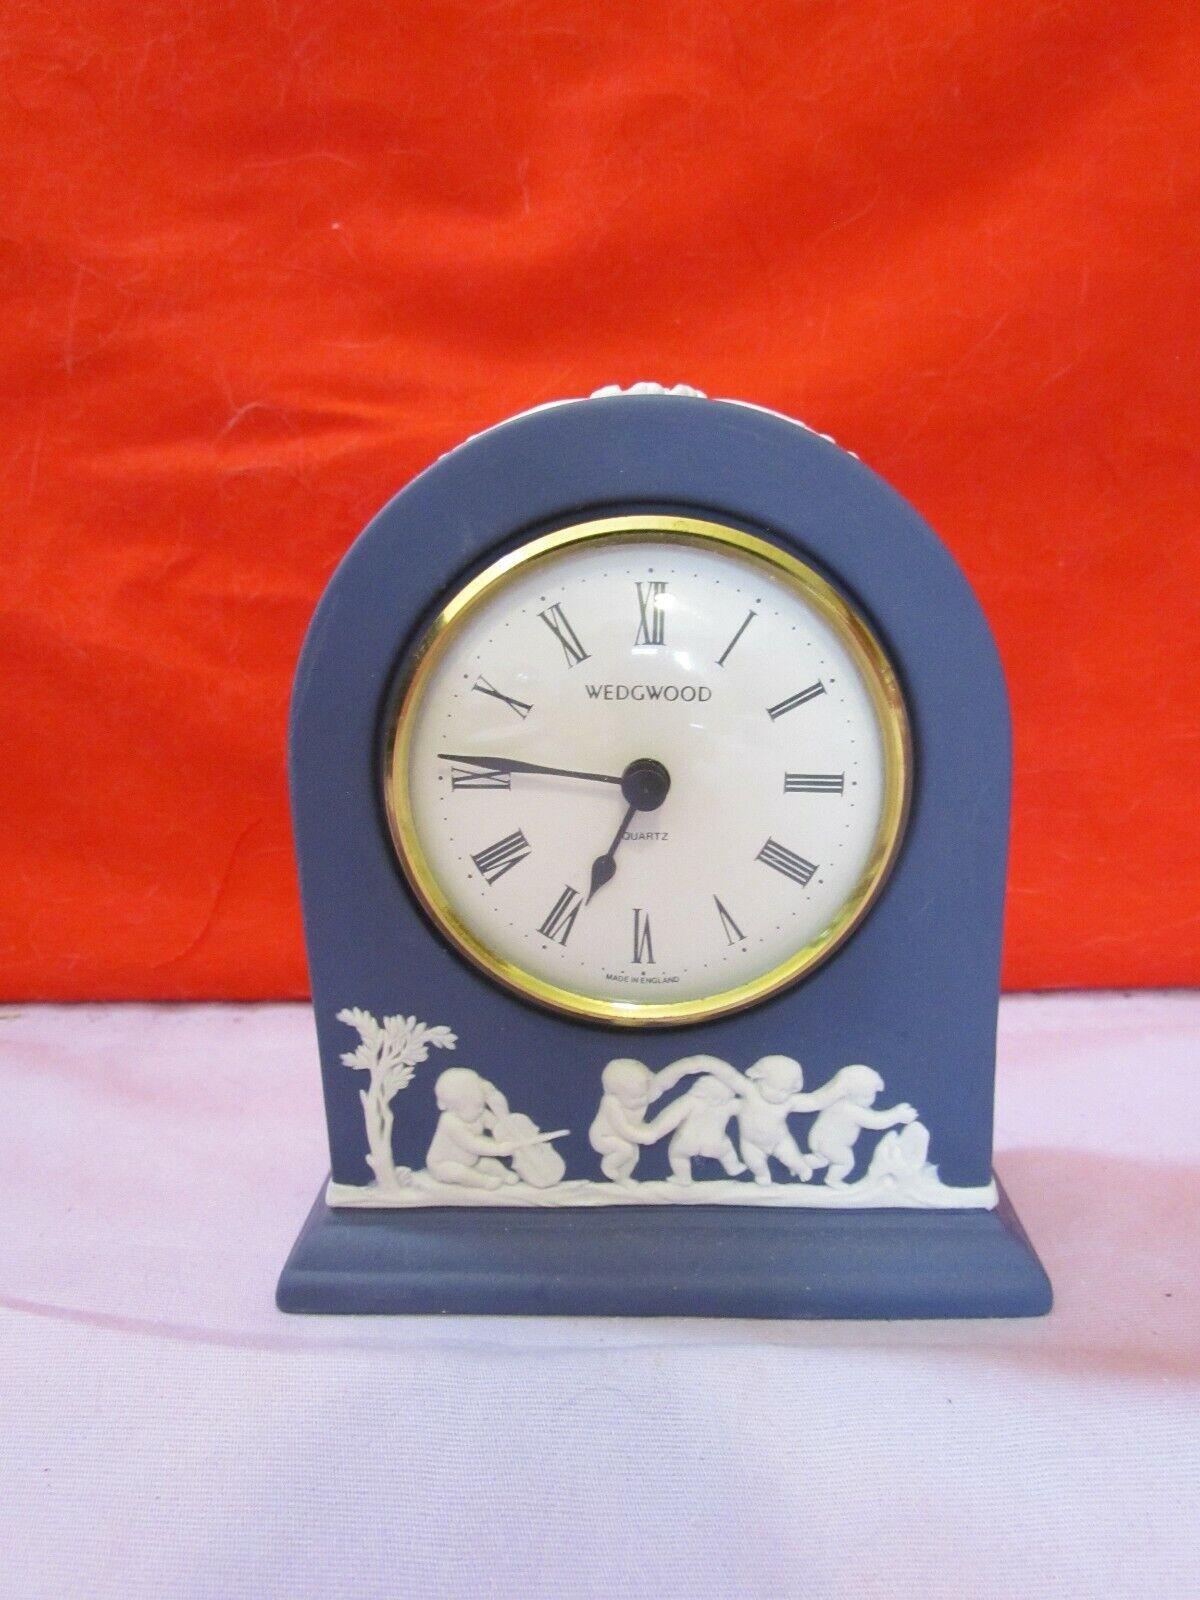 Image 1 - Wedgwood Blue Jasperware Clock Quartz England